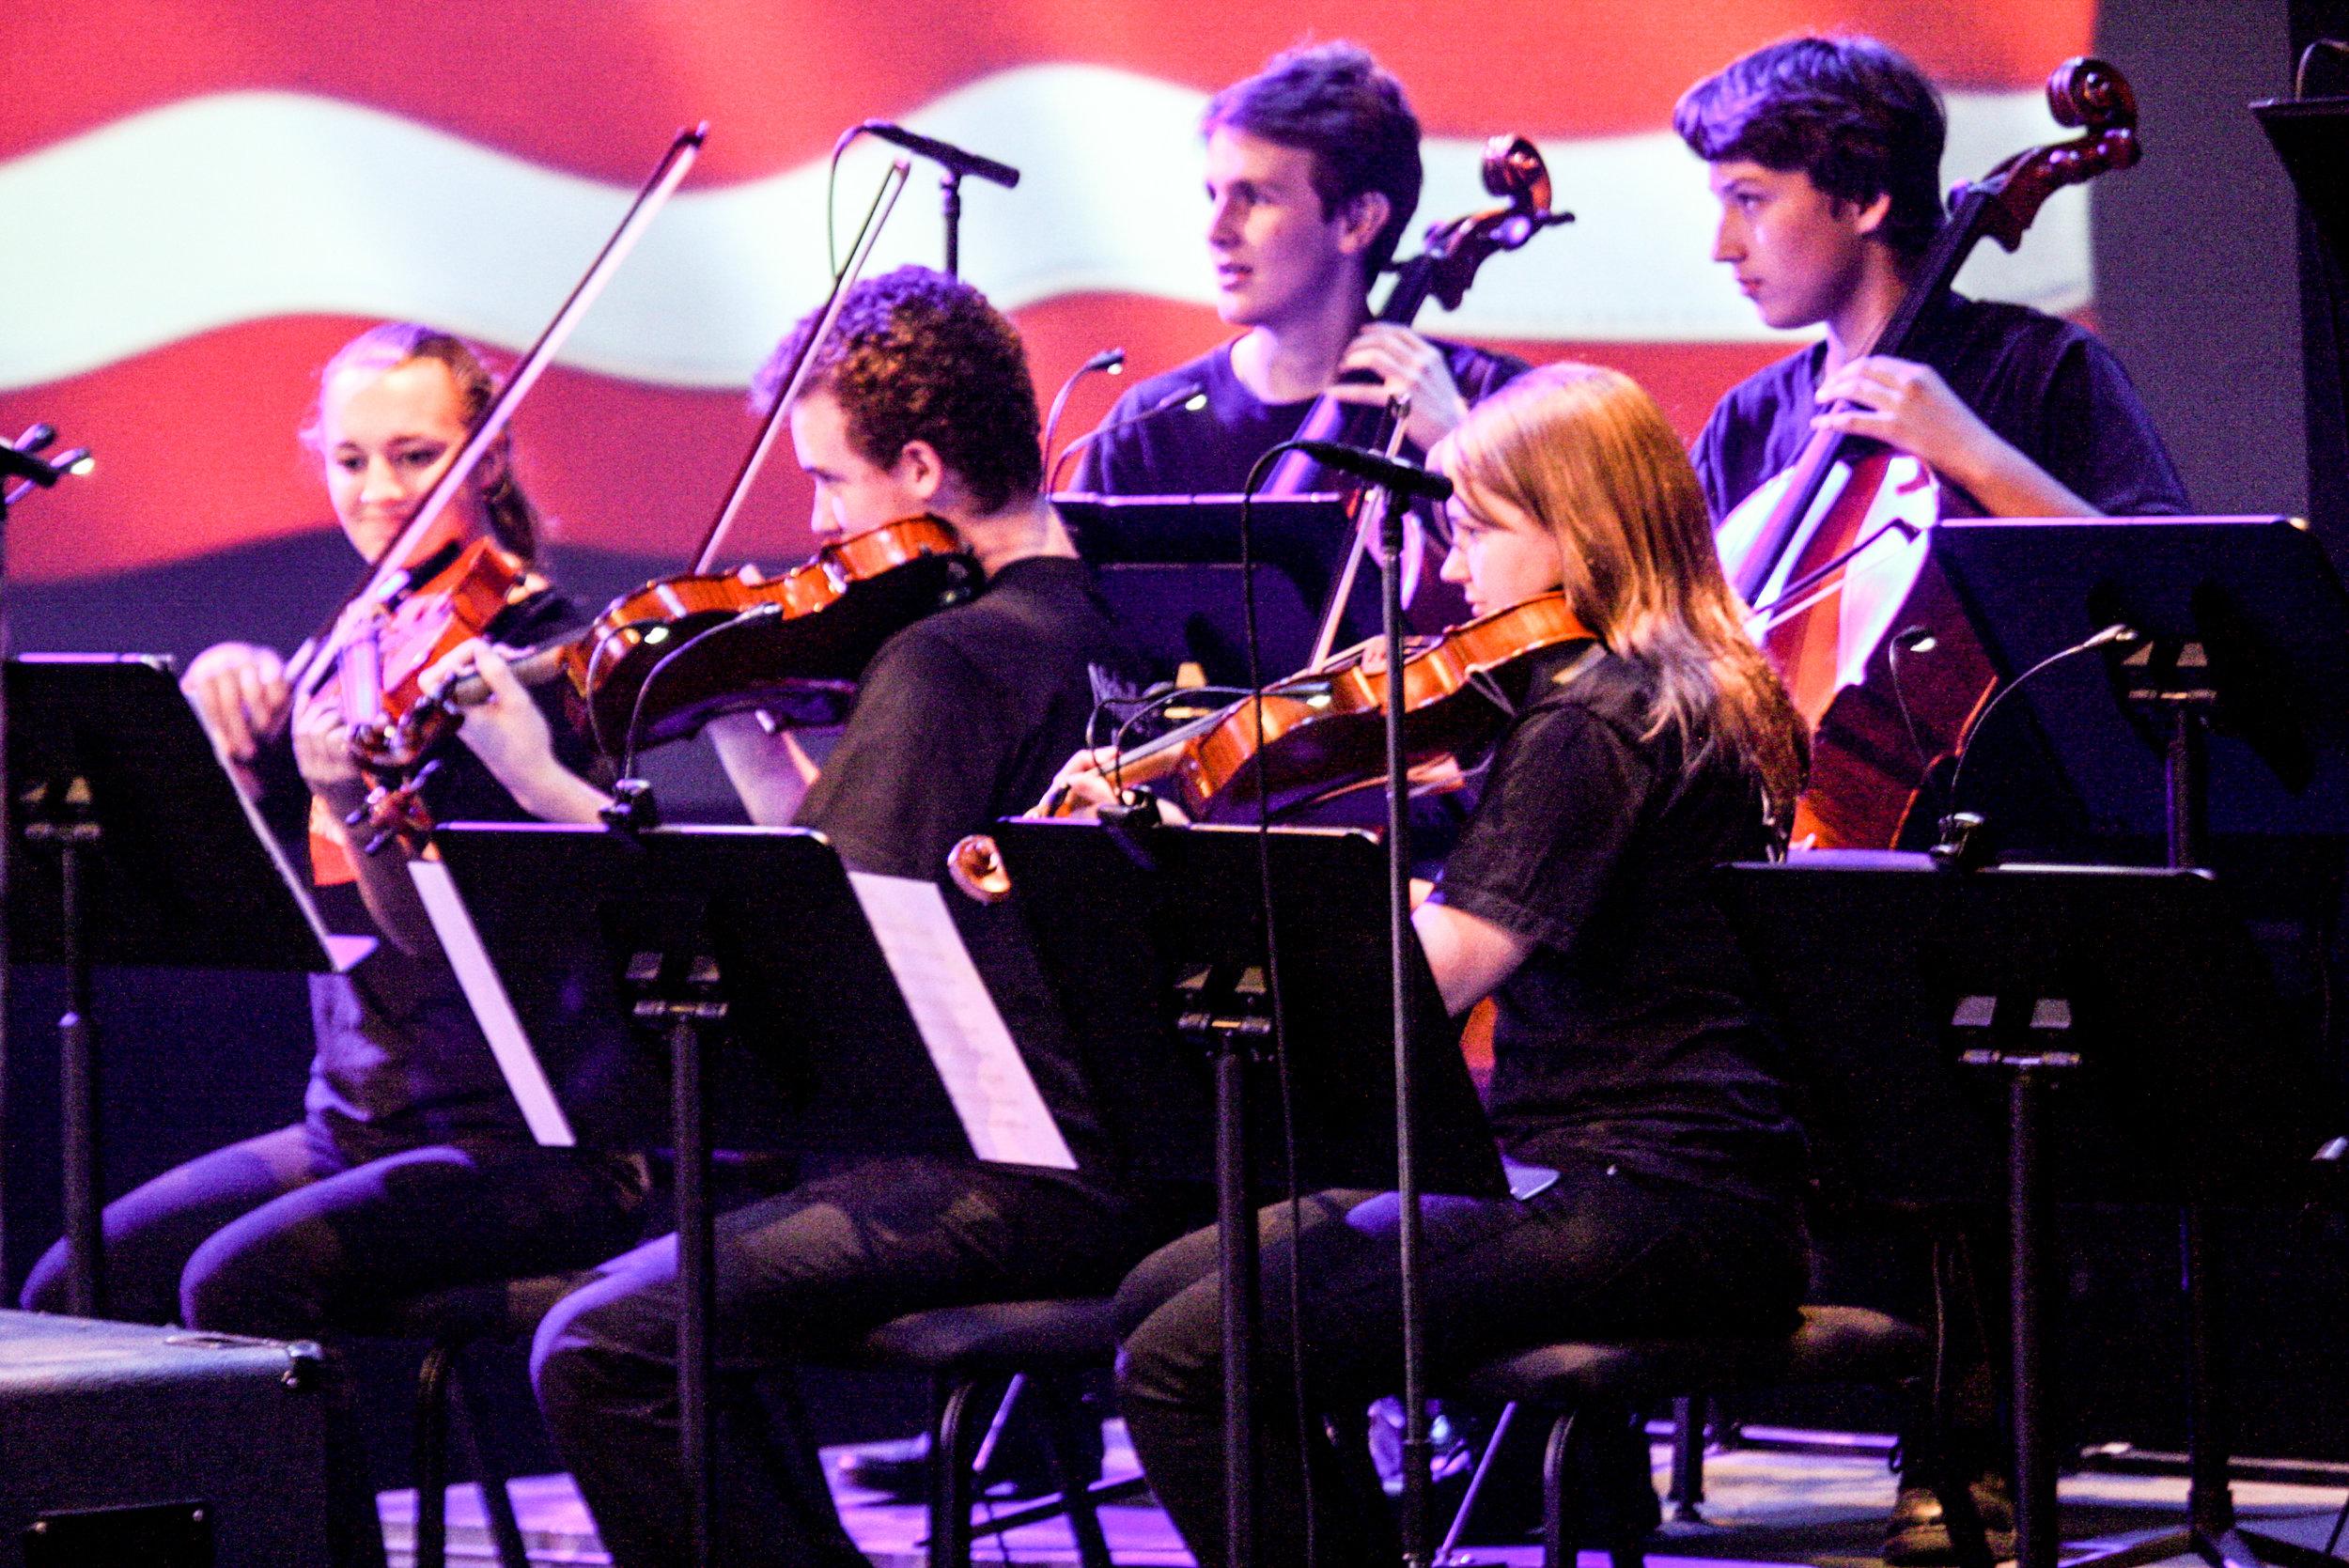 Music City Youth Orchestra 2013-14 1B.jpg